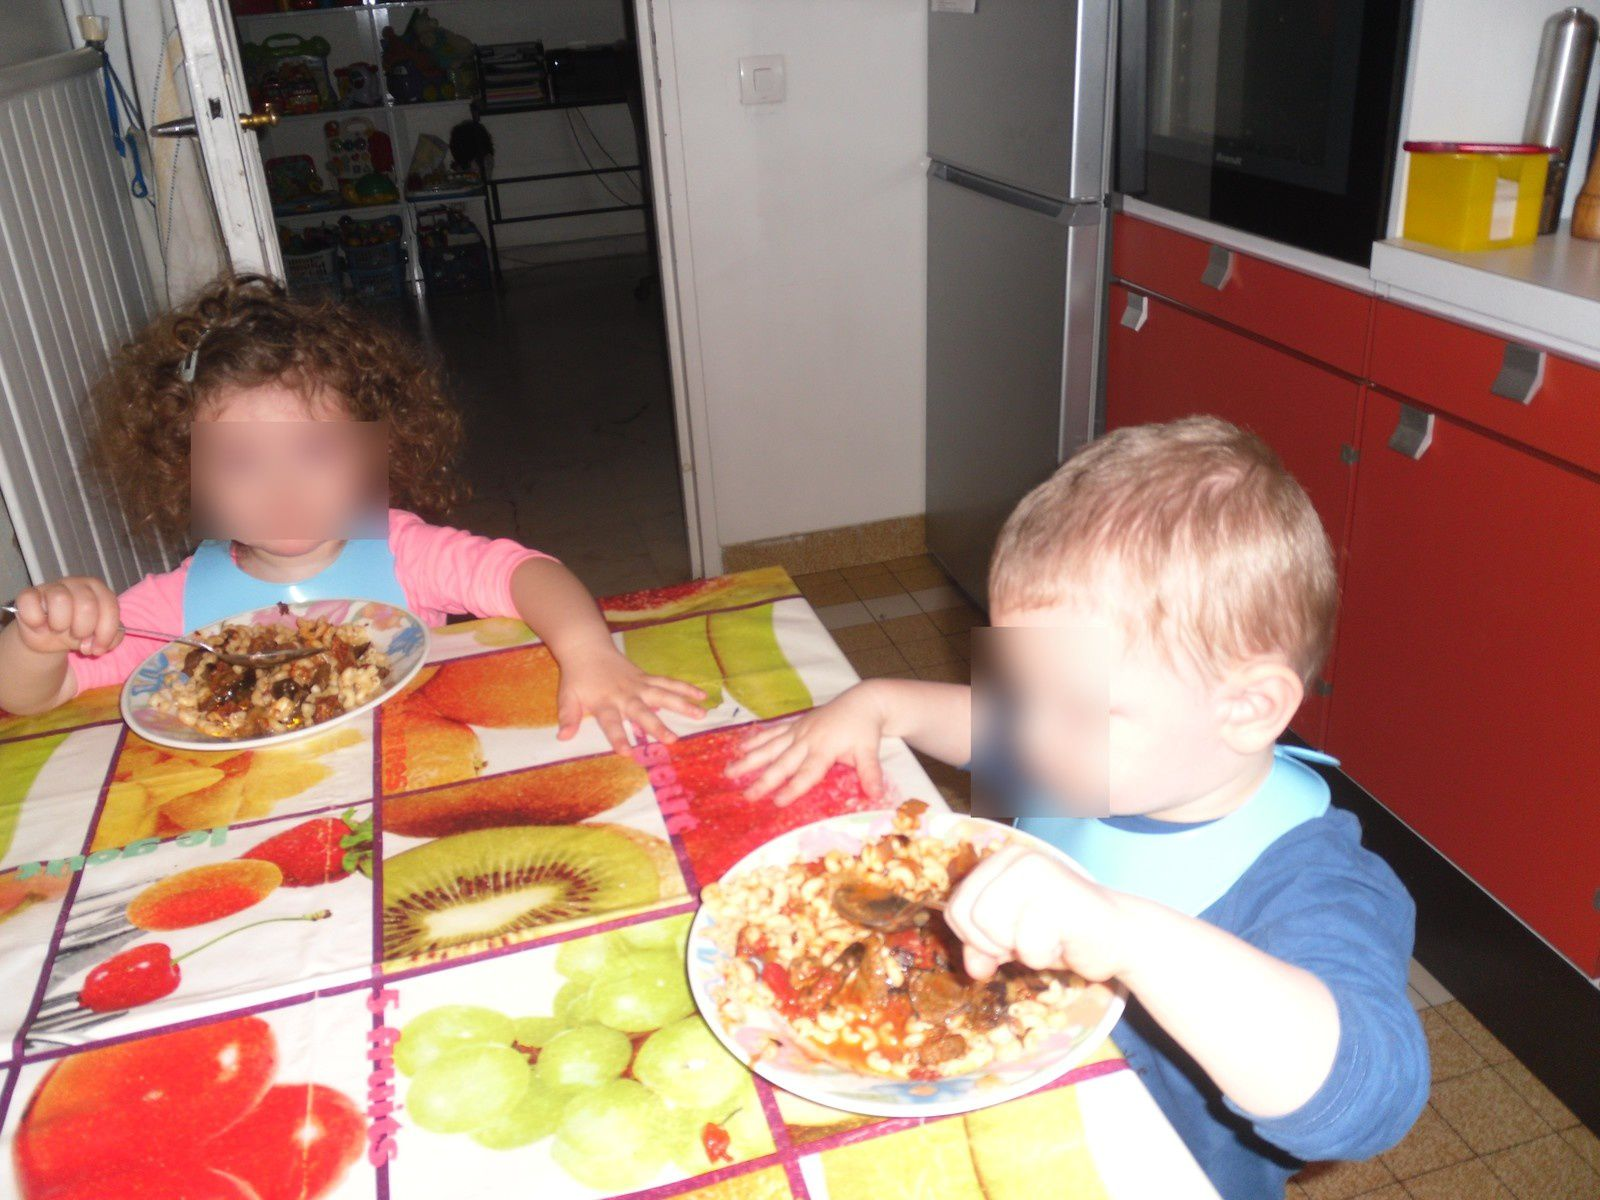 Le repas chez les tatas